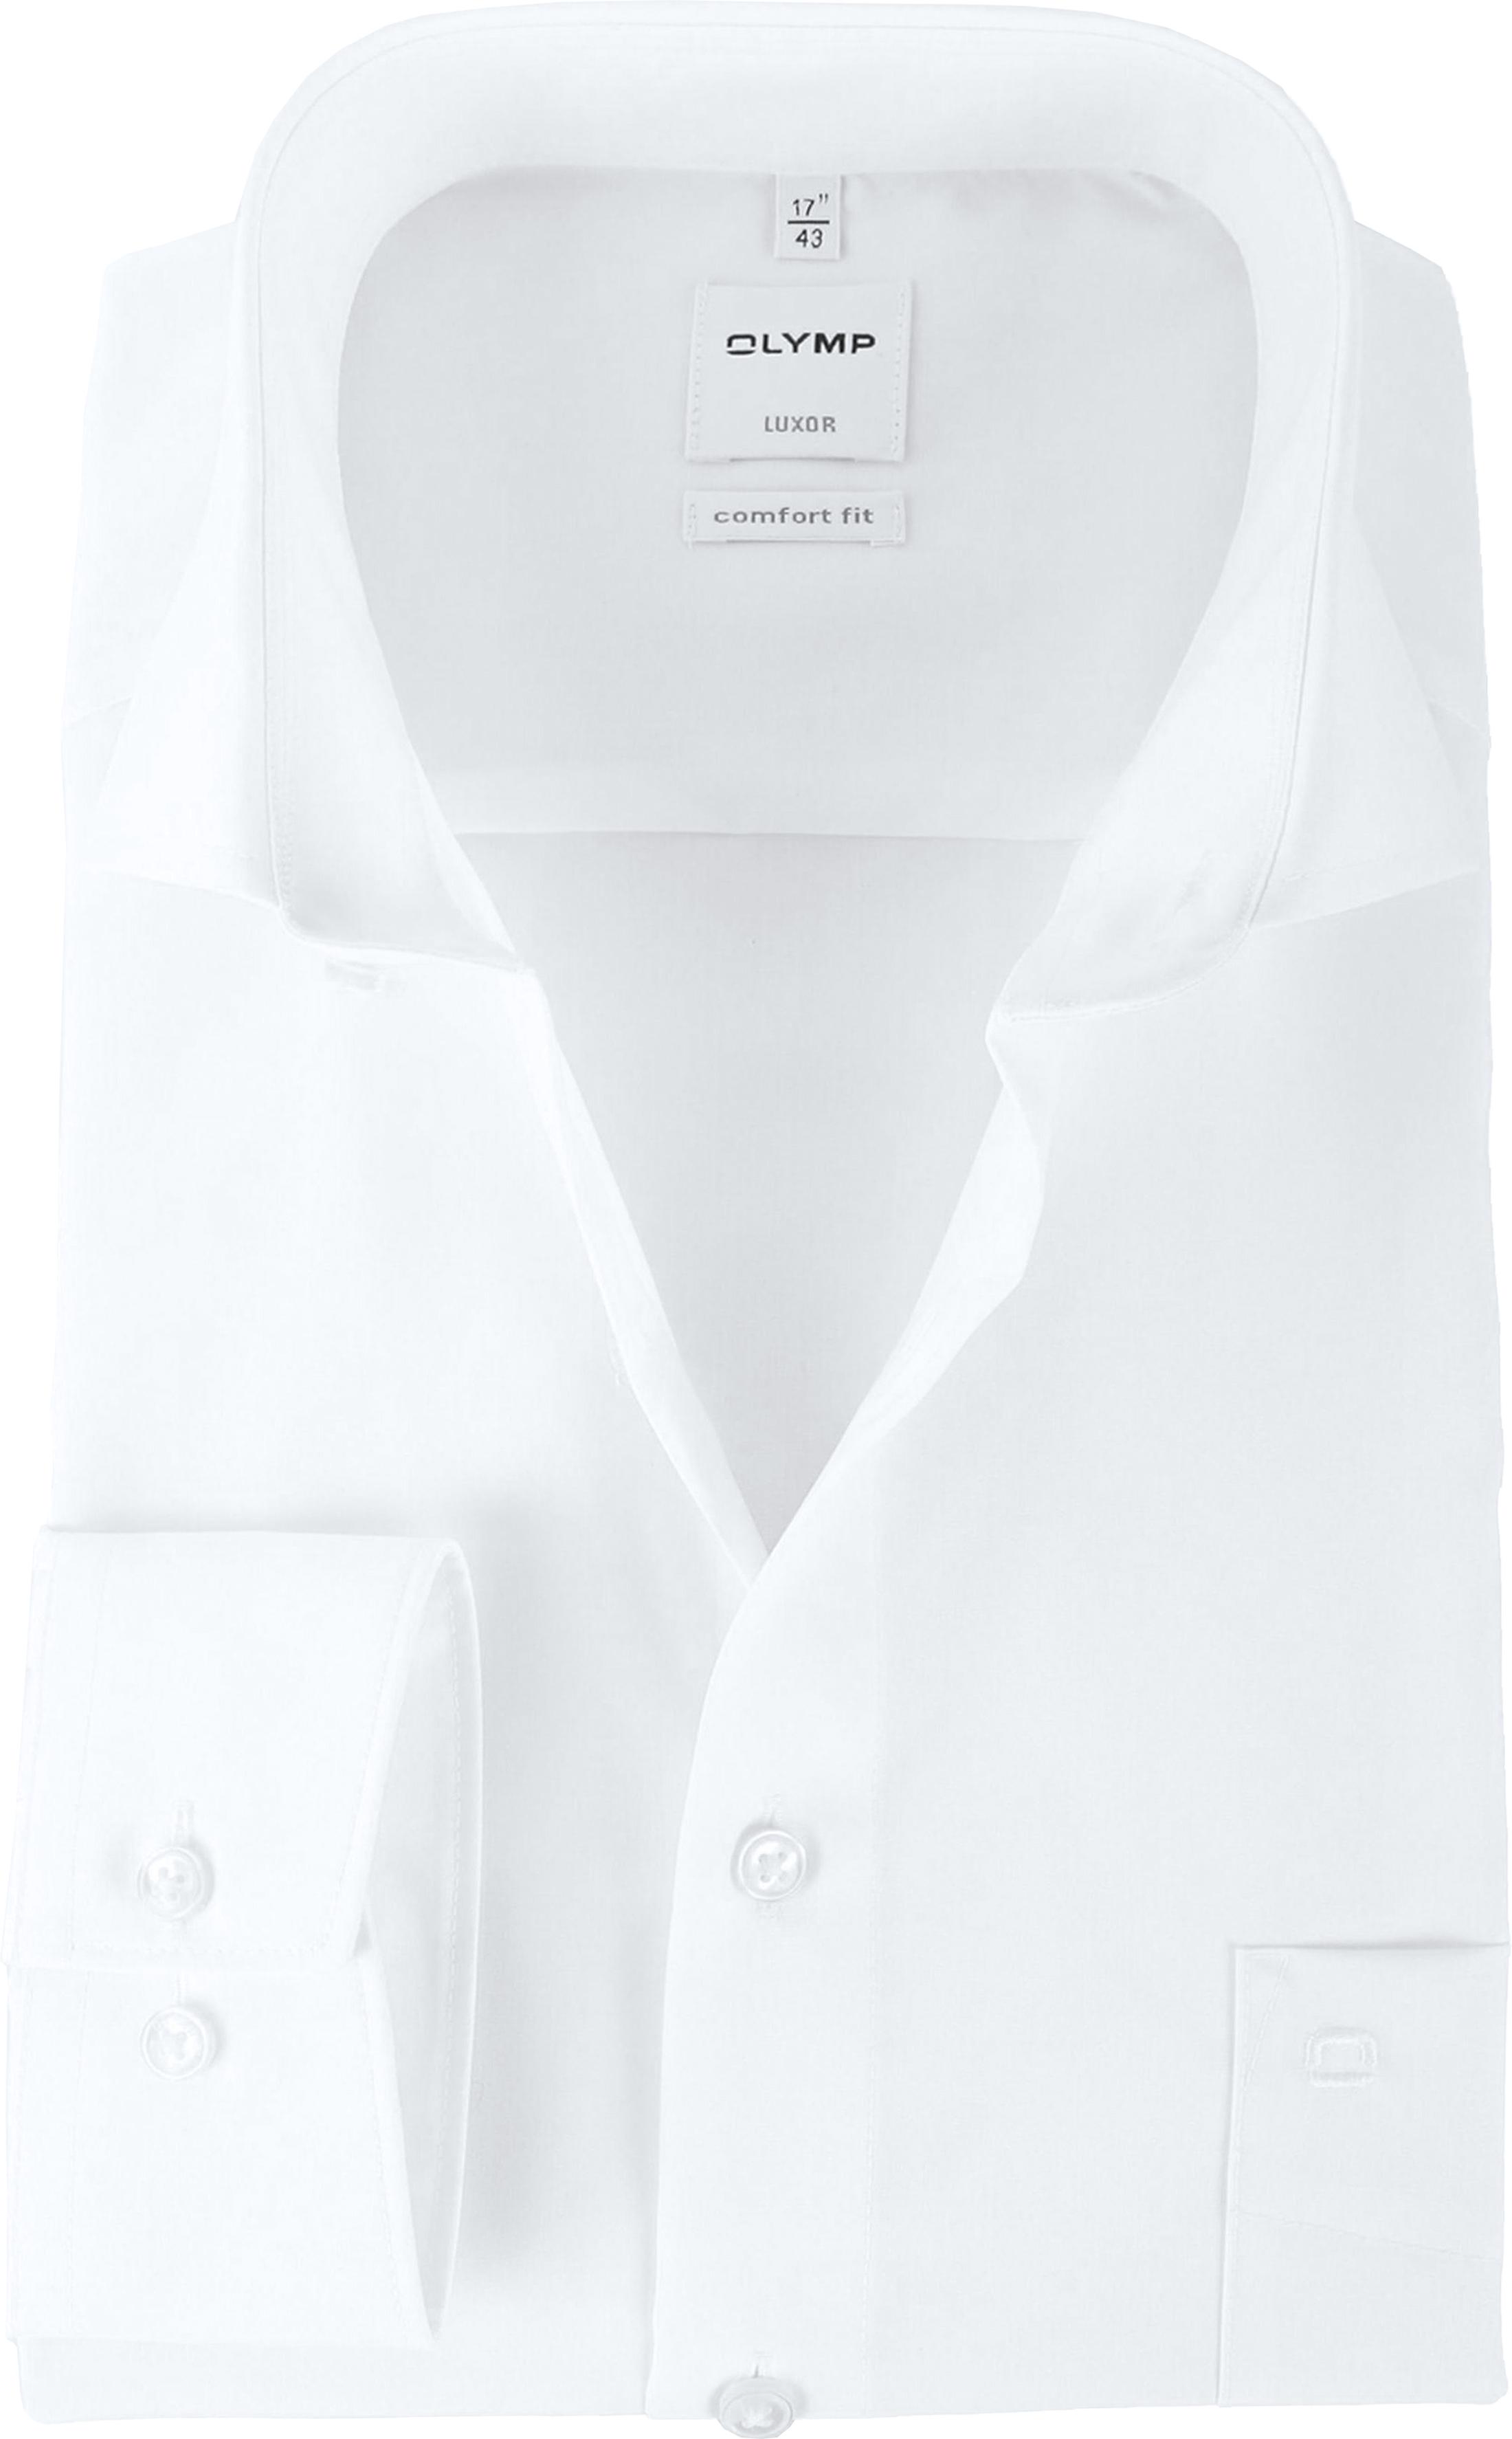 OLYMP Luxor Shirt Comfort Fit Cutaway foto 0